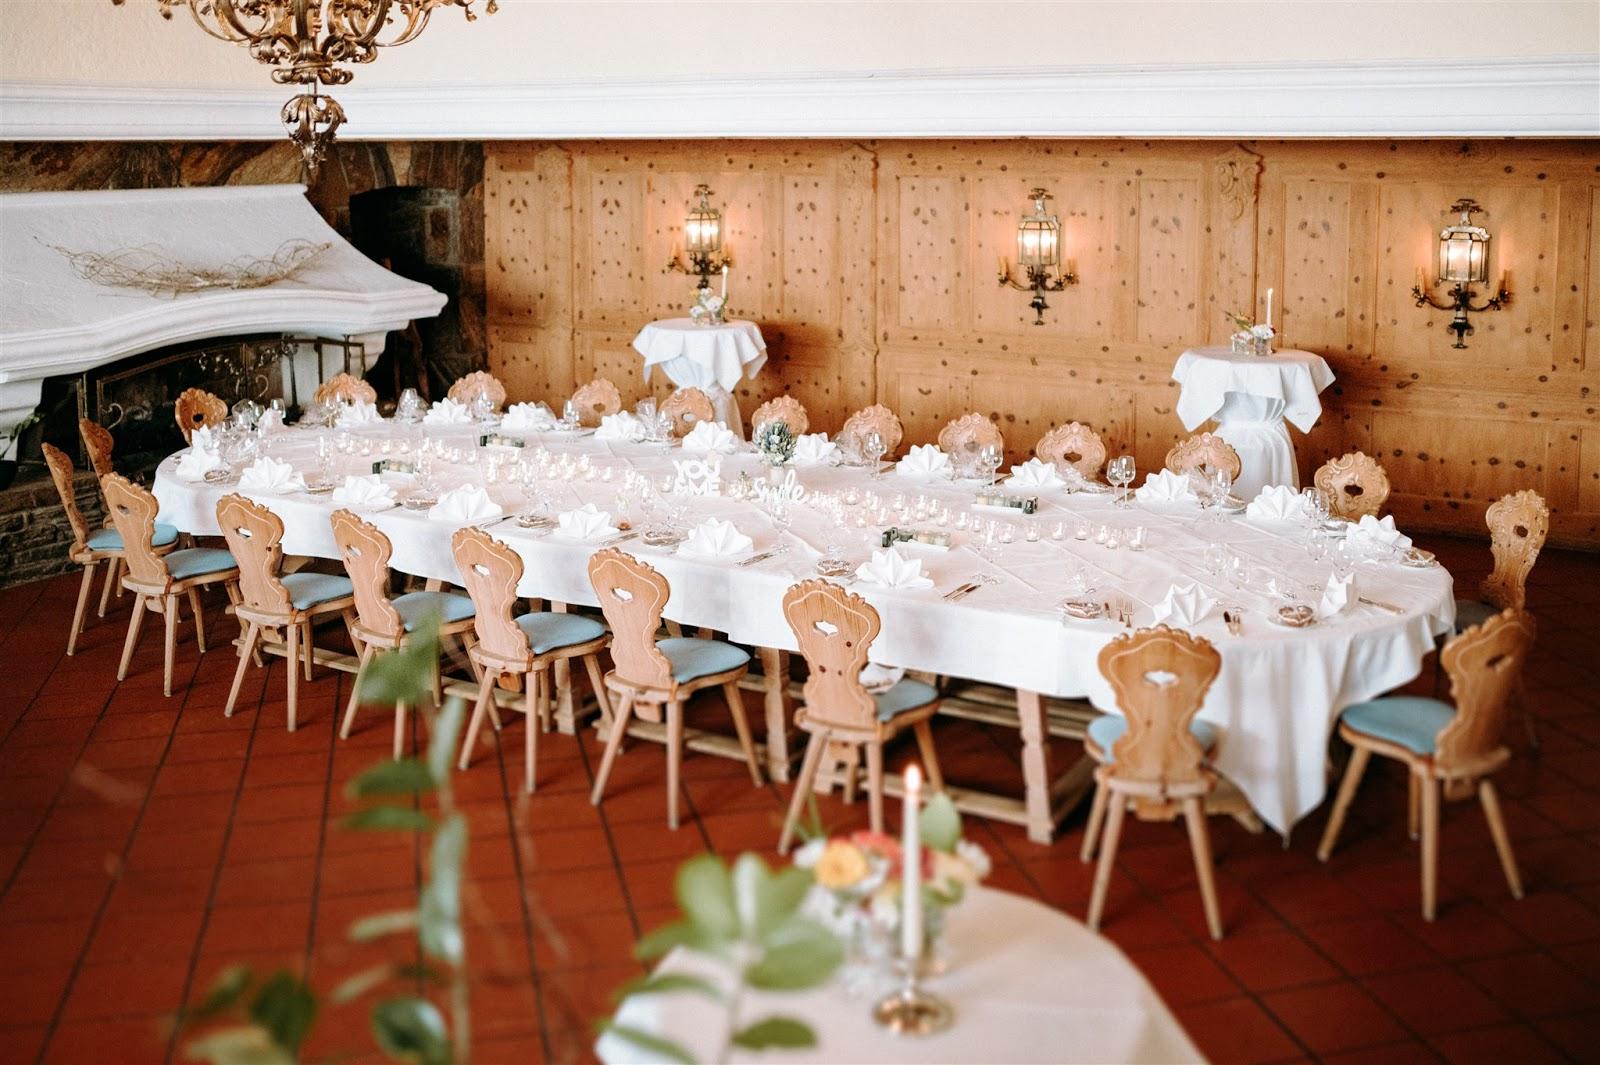 Parkhotel Wallgau, Mountain wedding, Berghochzeit, destination wedding Bavaria, Wallgau, photo credit Magnus Winterholler Gipfelliebe, wedding planner Uschi Glas 4 weddings & events